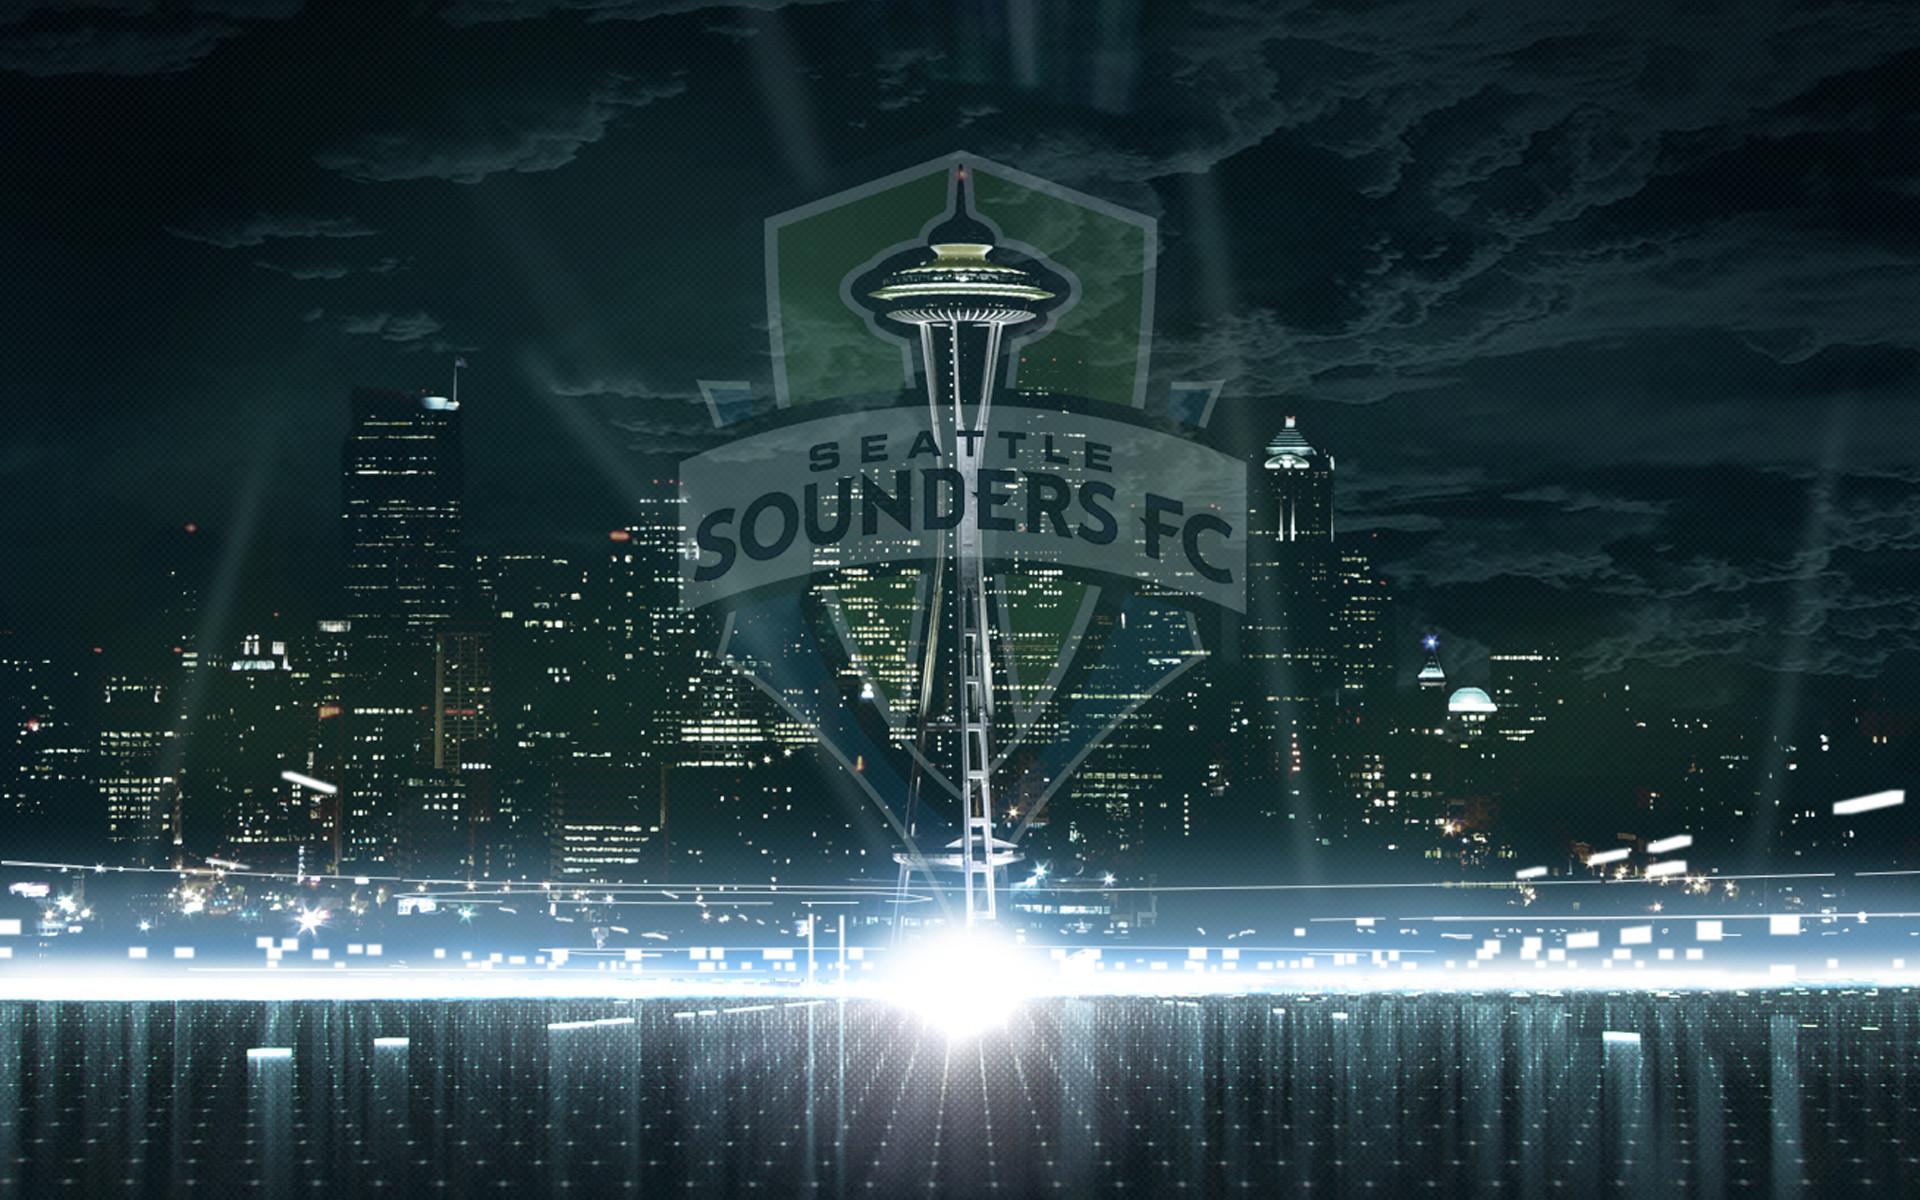 Seattle Sounders IPhone Wallpaper GR44K6Ujpg   Picseriocom 1920x1200